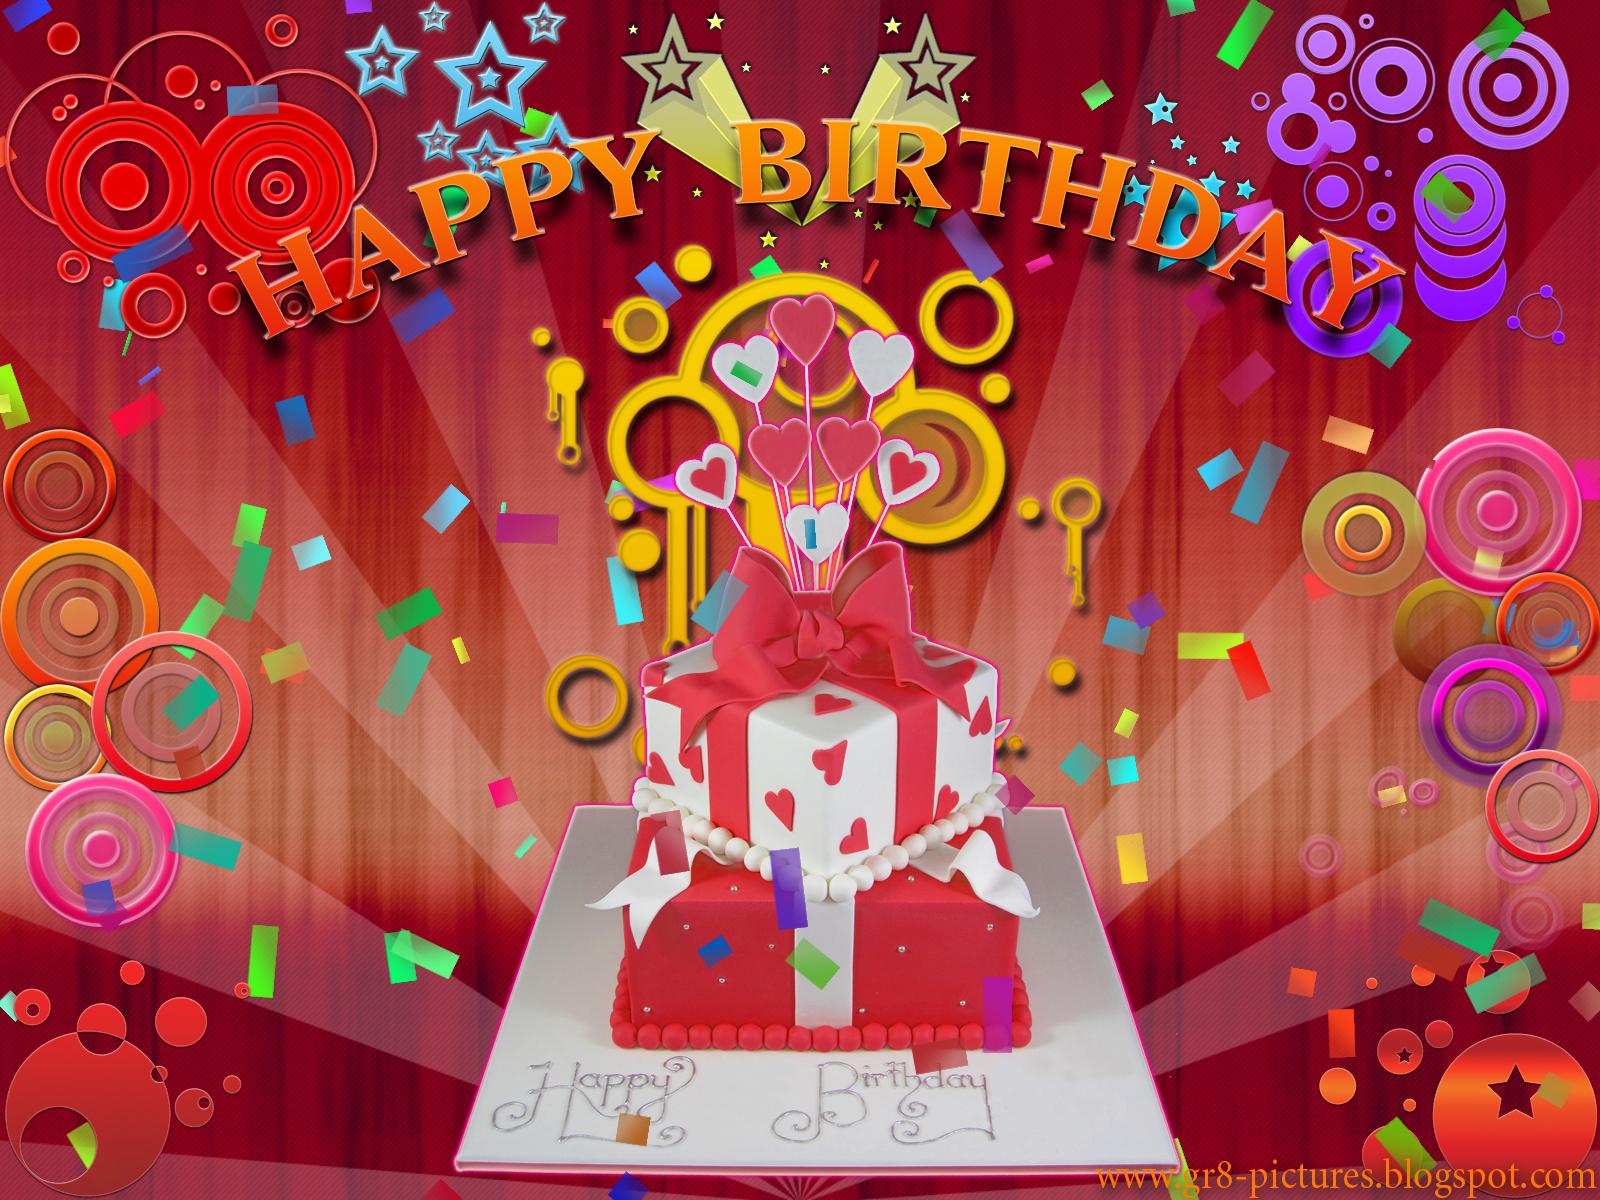 HD Wallpapers: Birthday